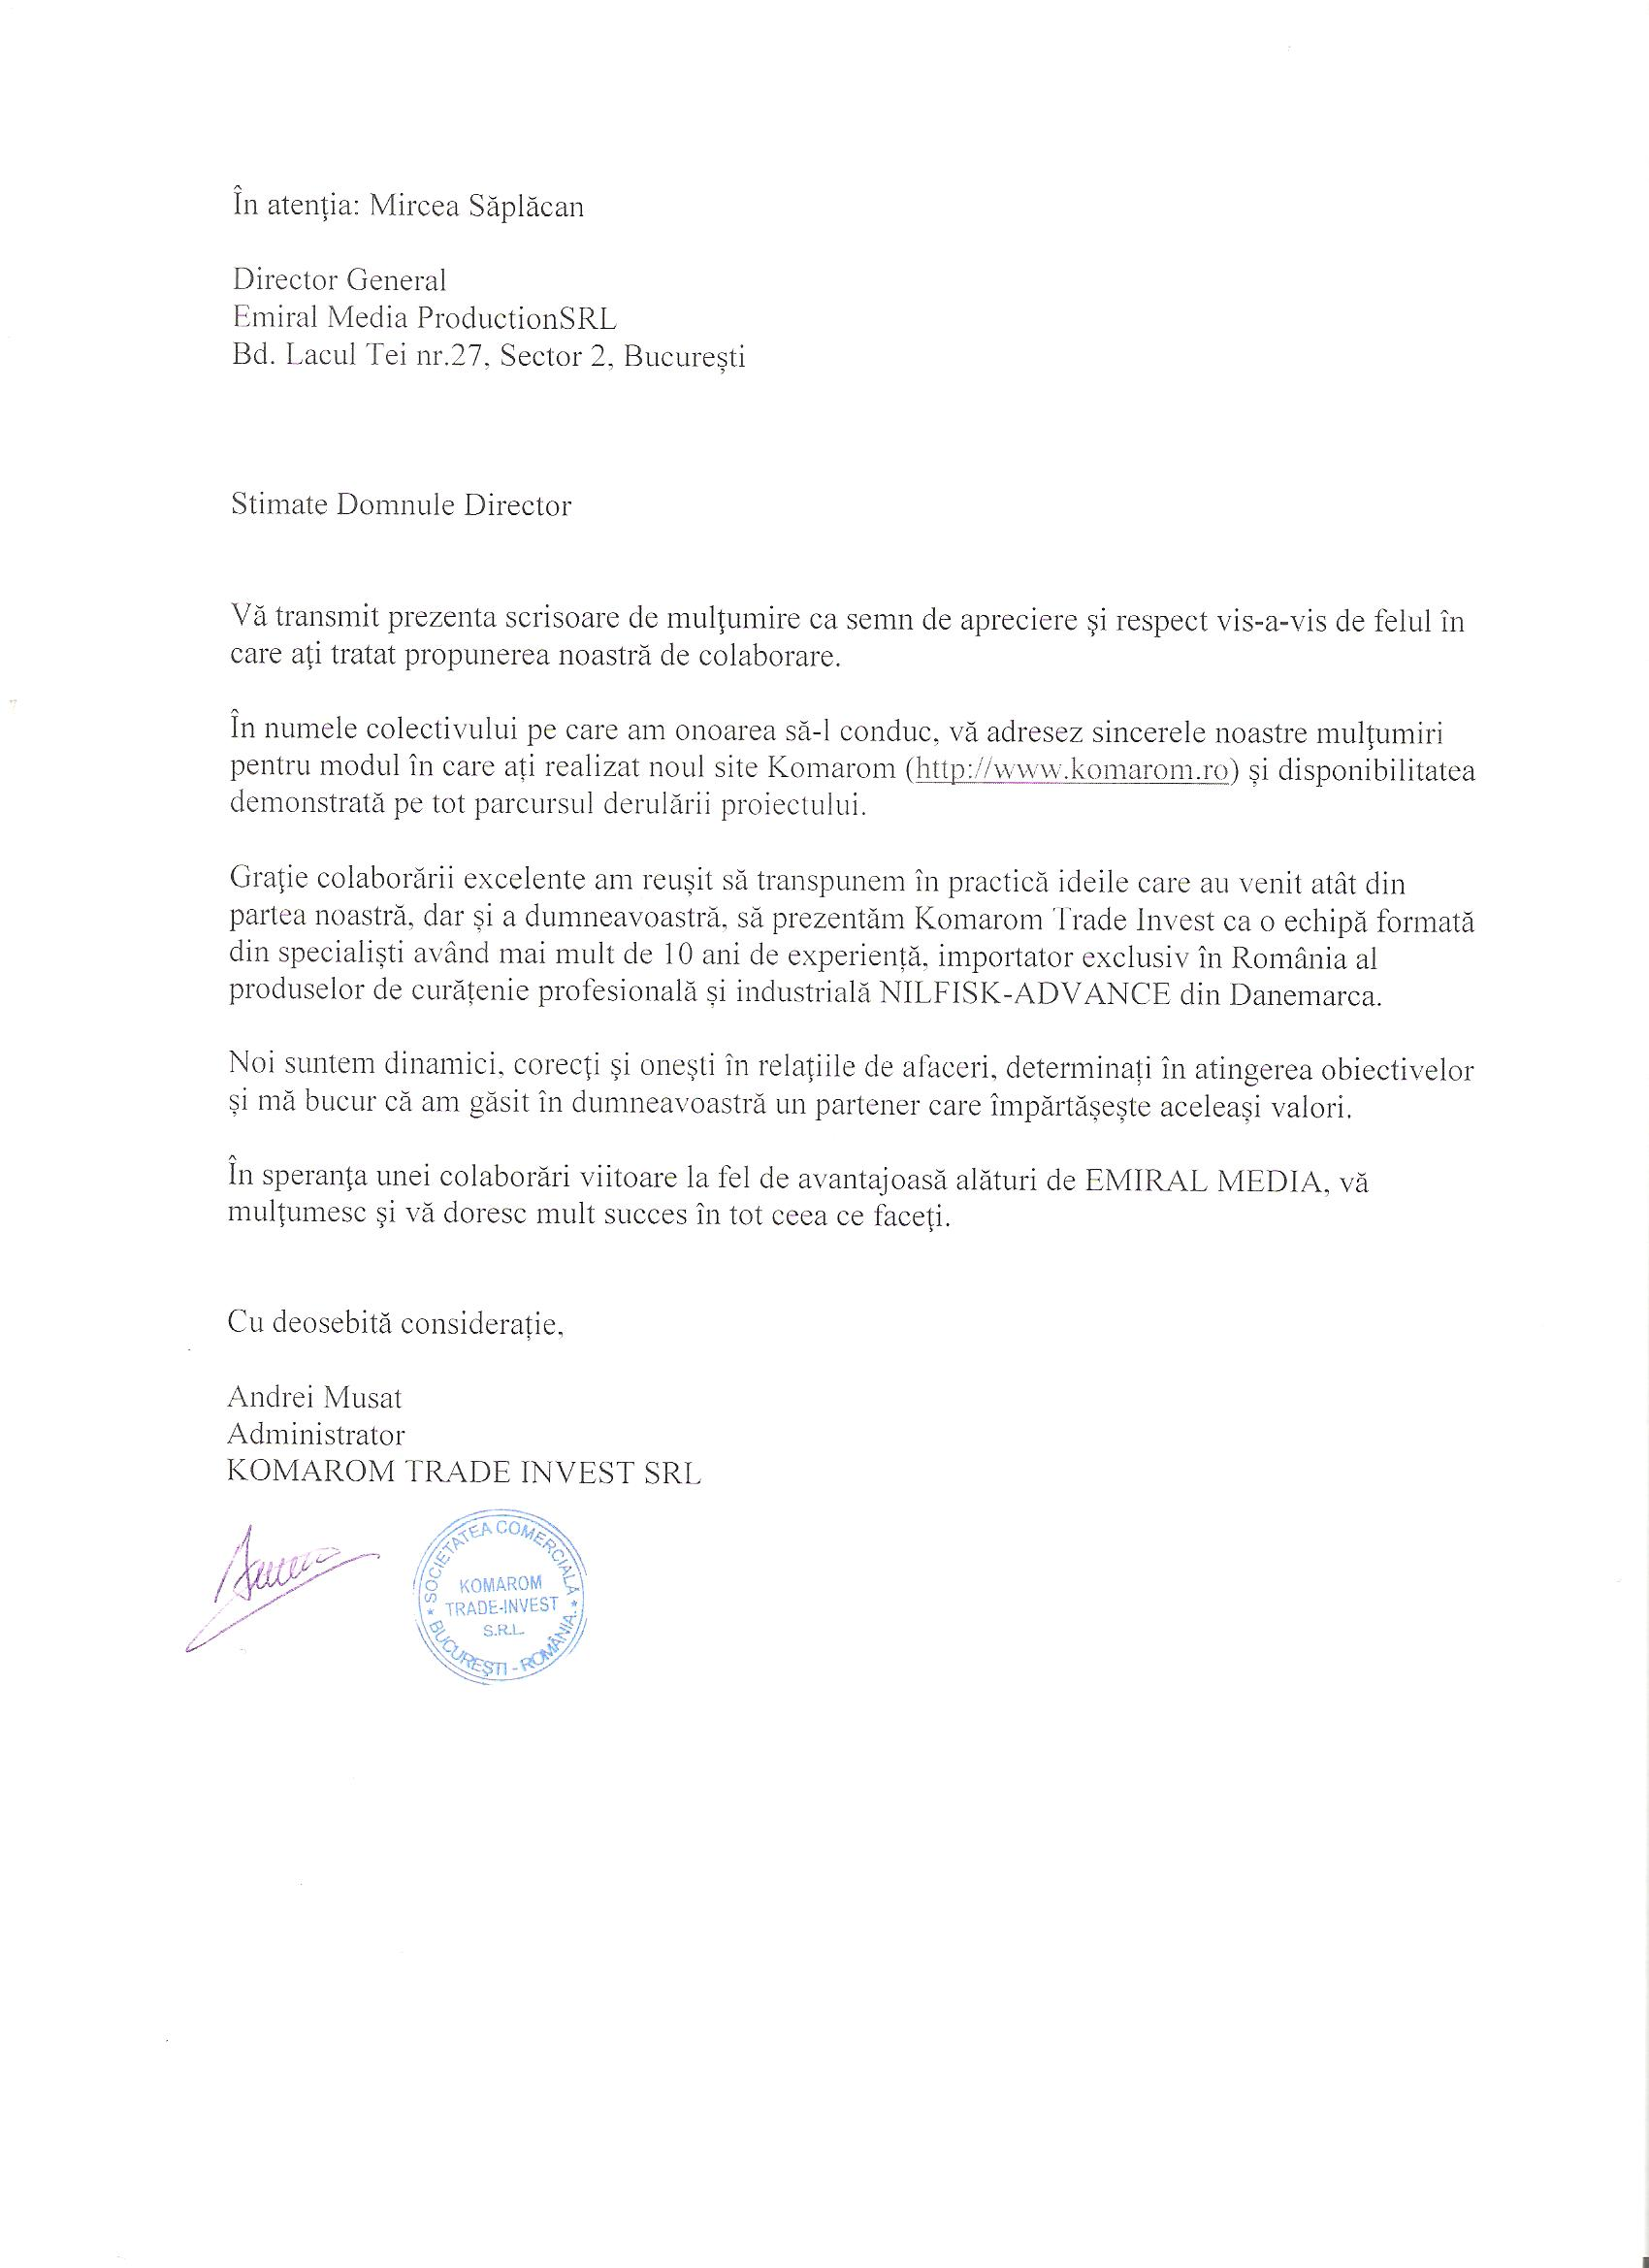 scrisoare-recomandare-komarom